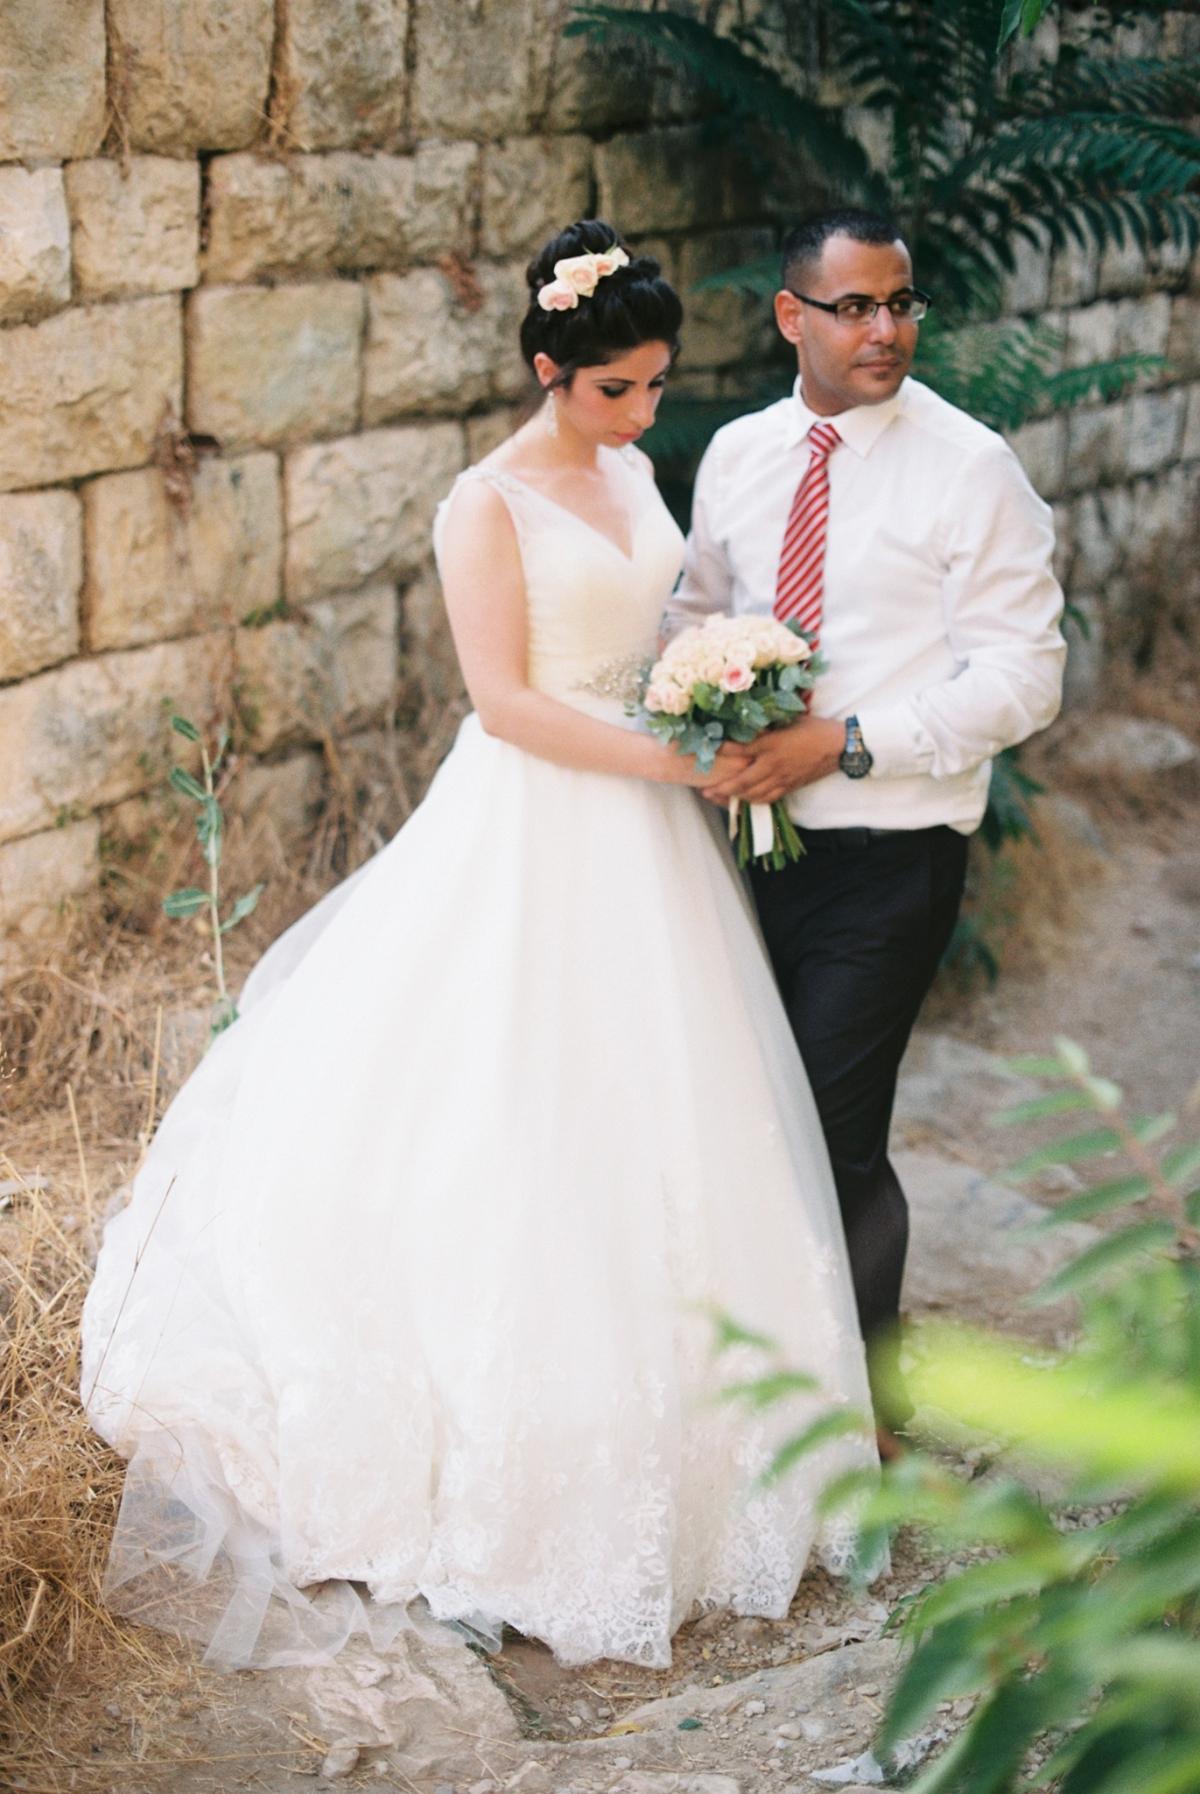 Lifta Bridal Portraits - Jerusalem Israel - Muna and Ali - Sigala Photography_0002